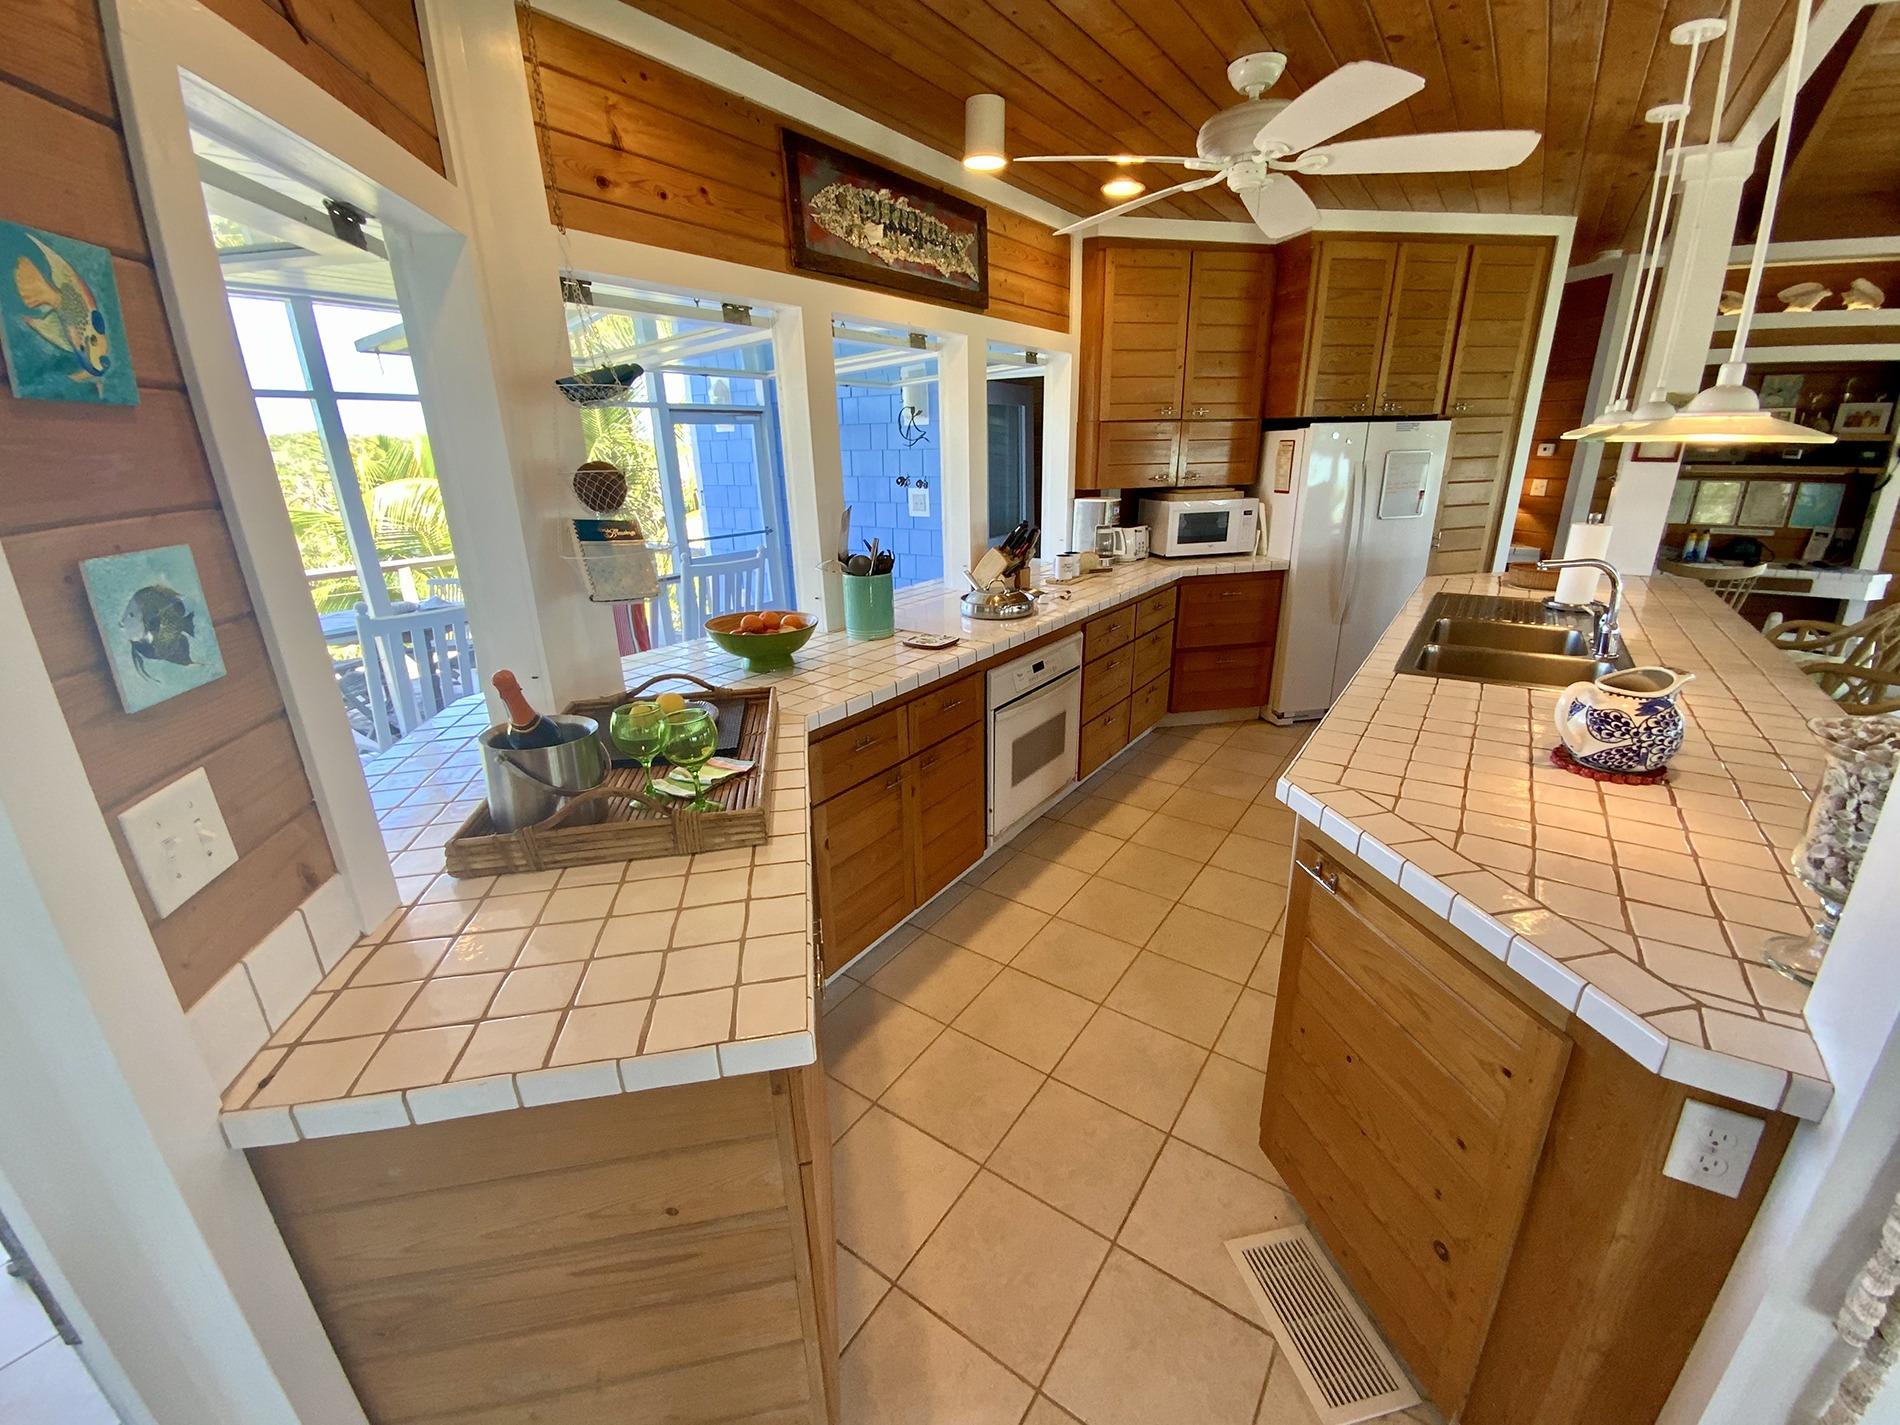 18 Calypso Kitchen North